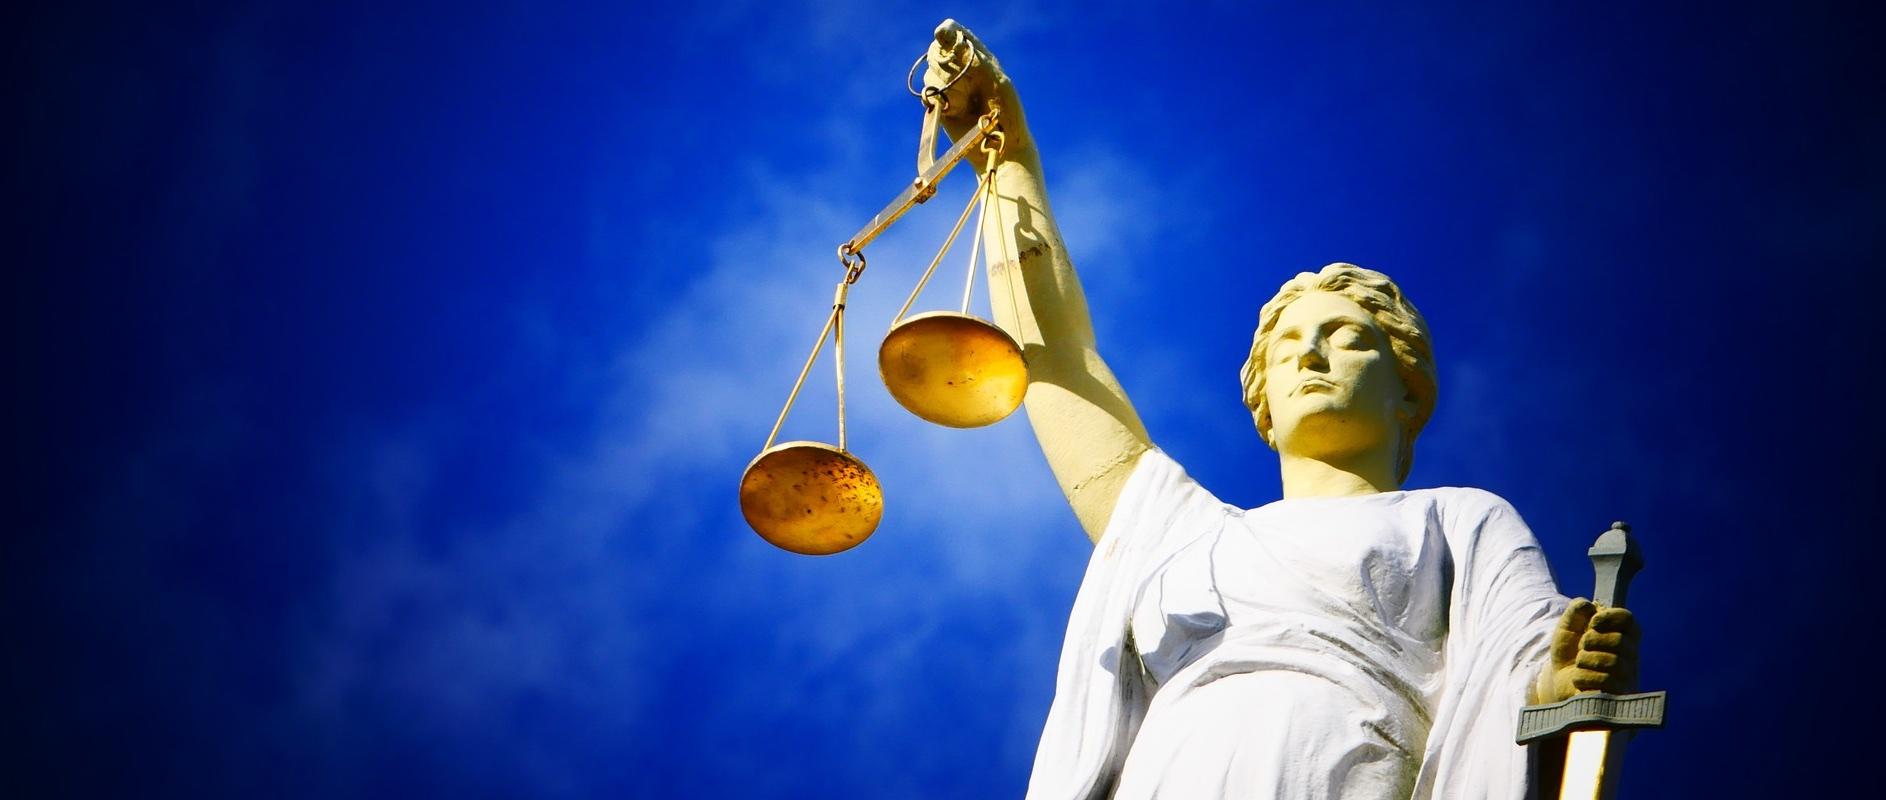 Justizia -